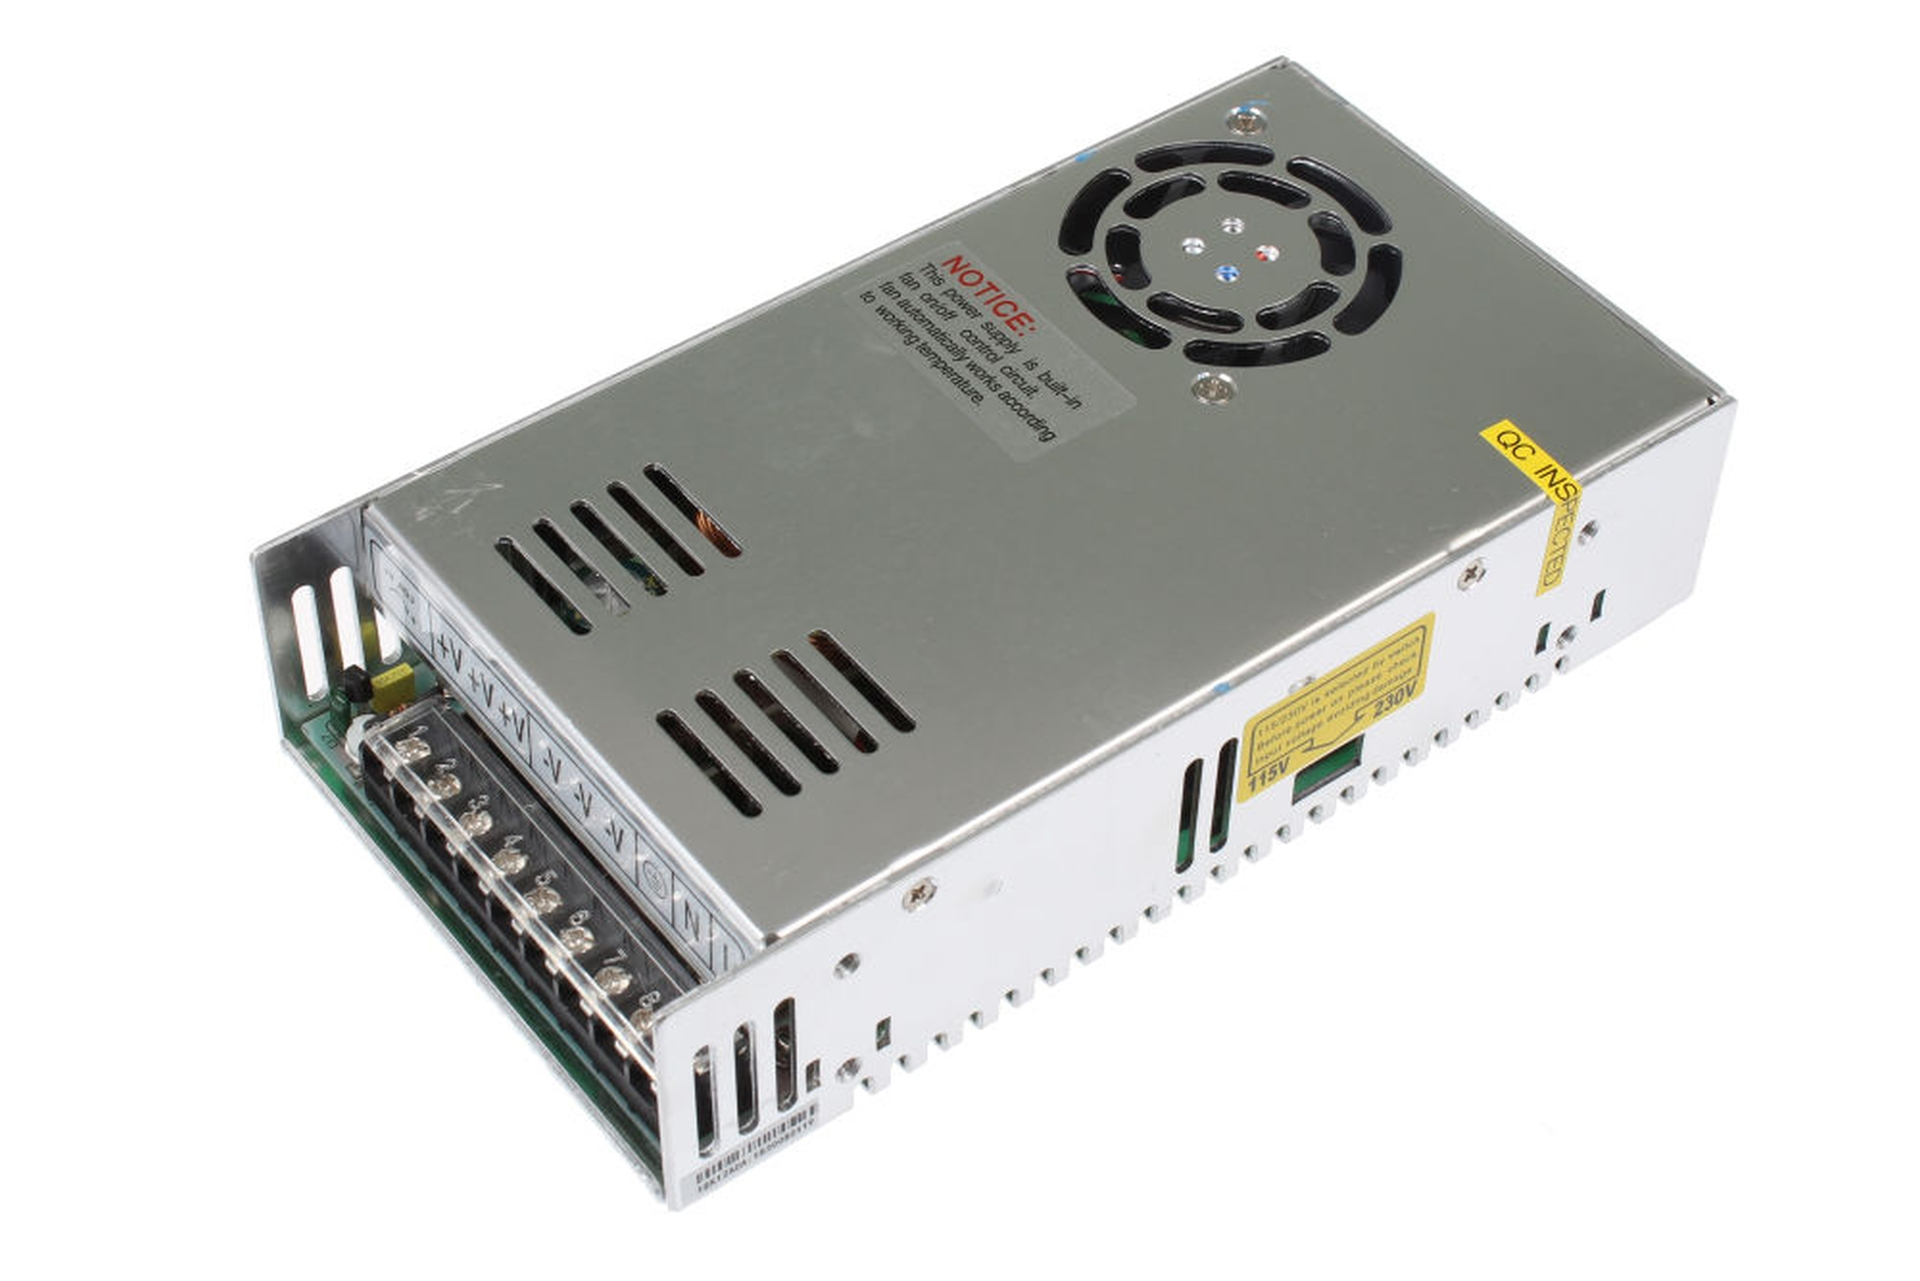 T-LED LED zdroj (trafo) 24V 480W - vnutorný 05527